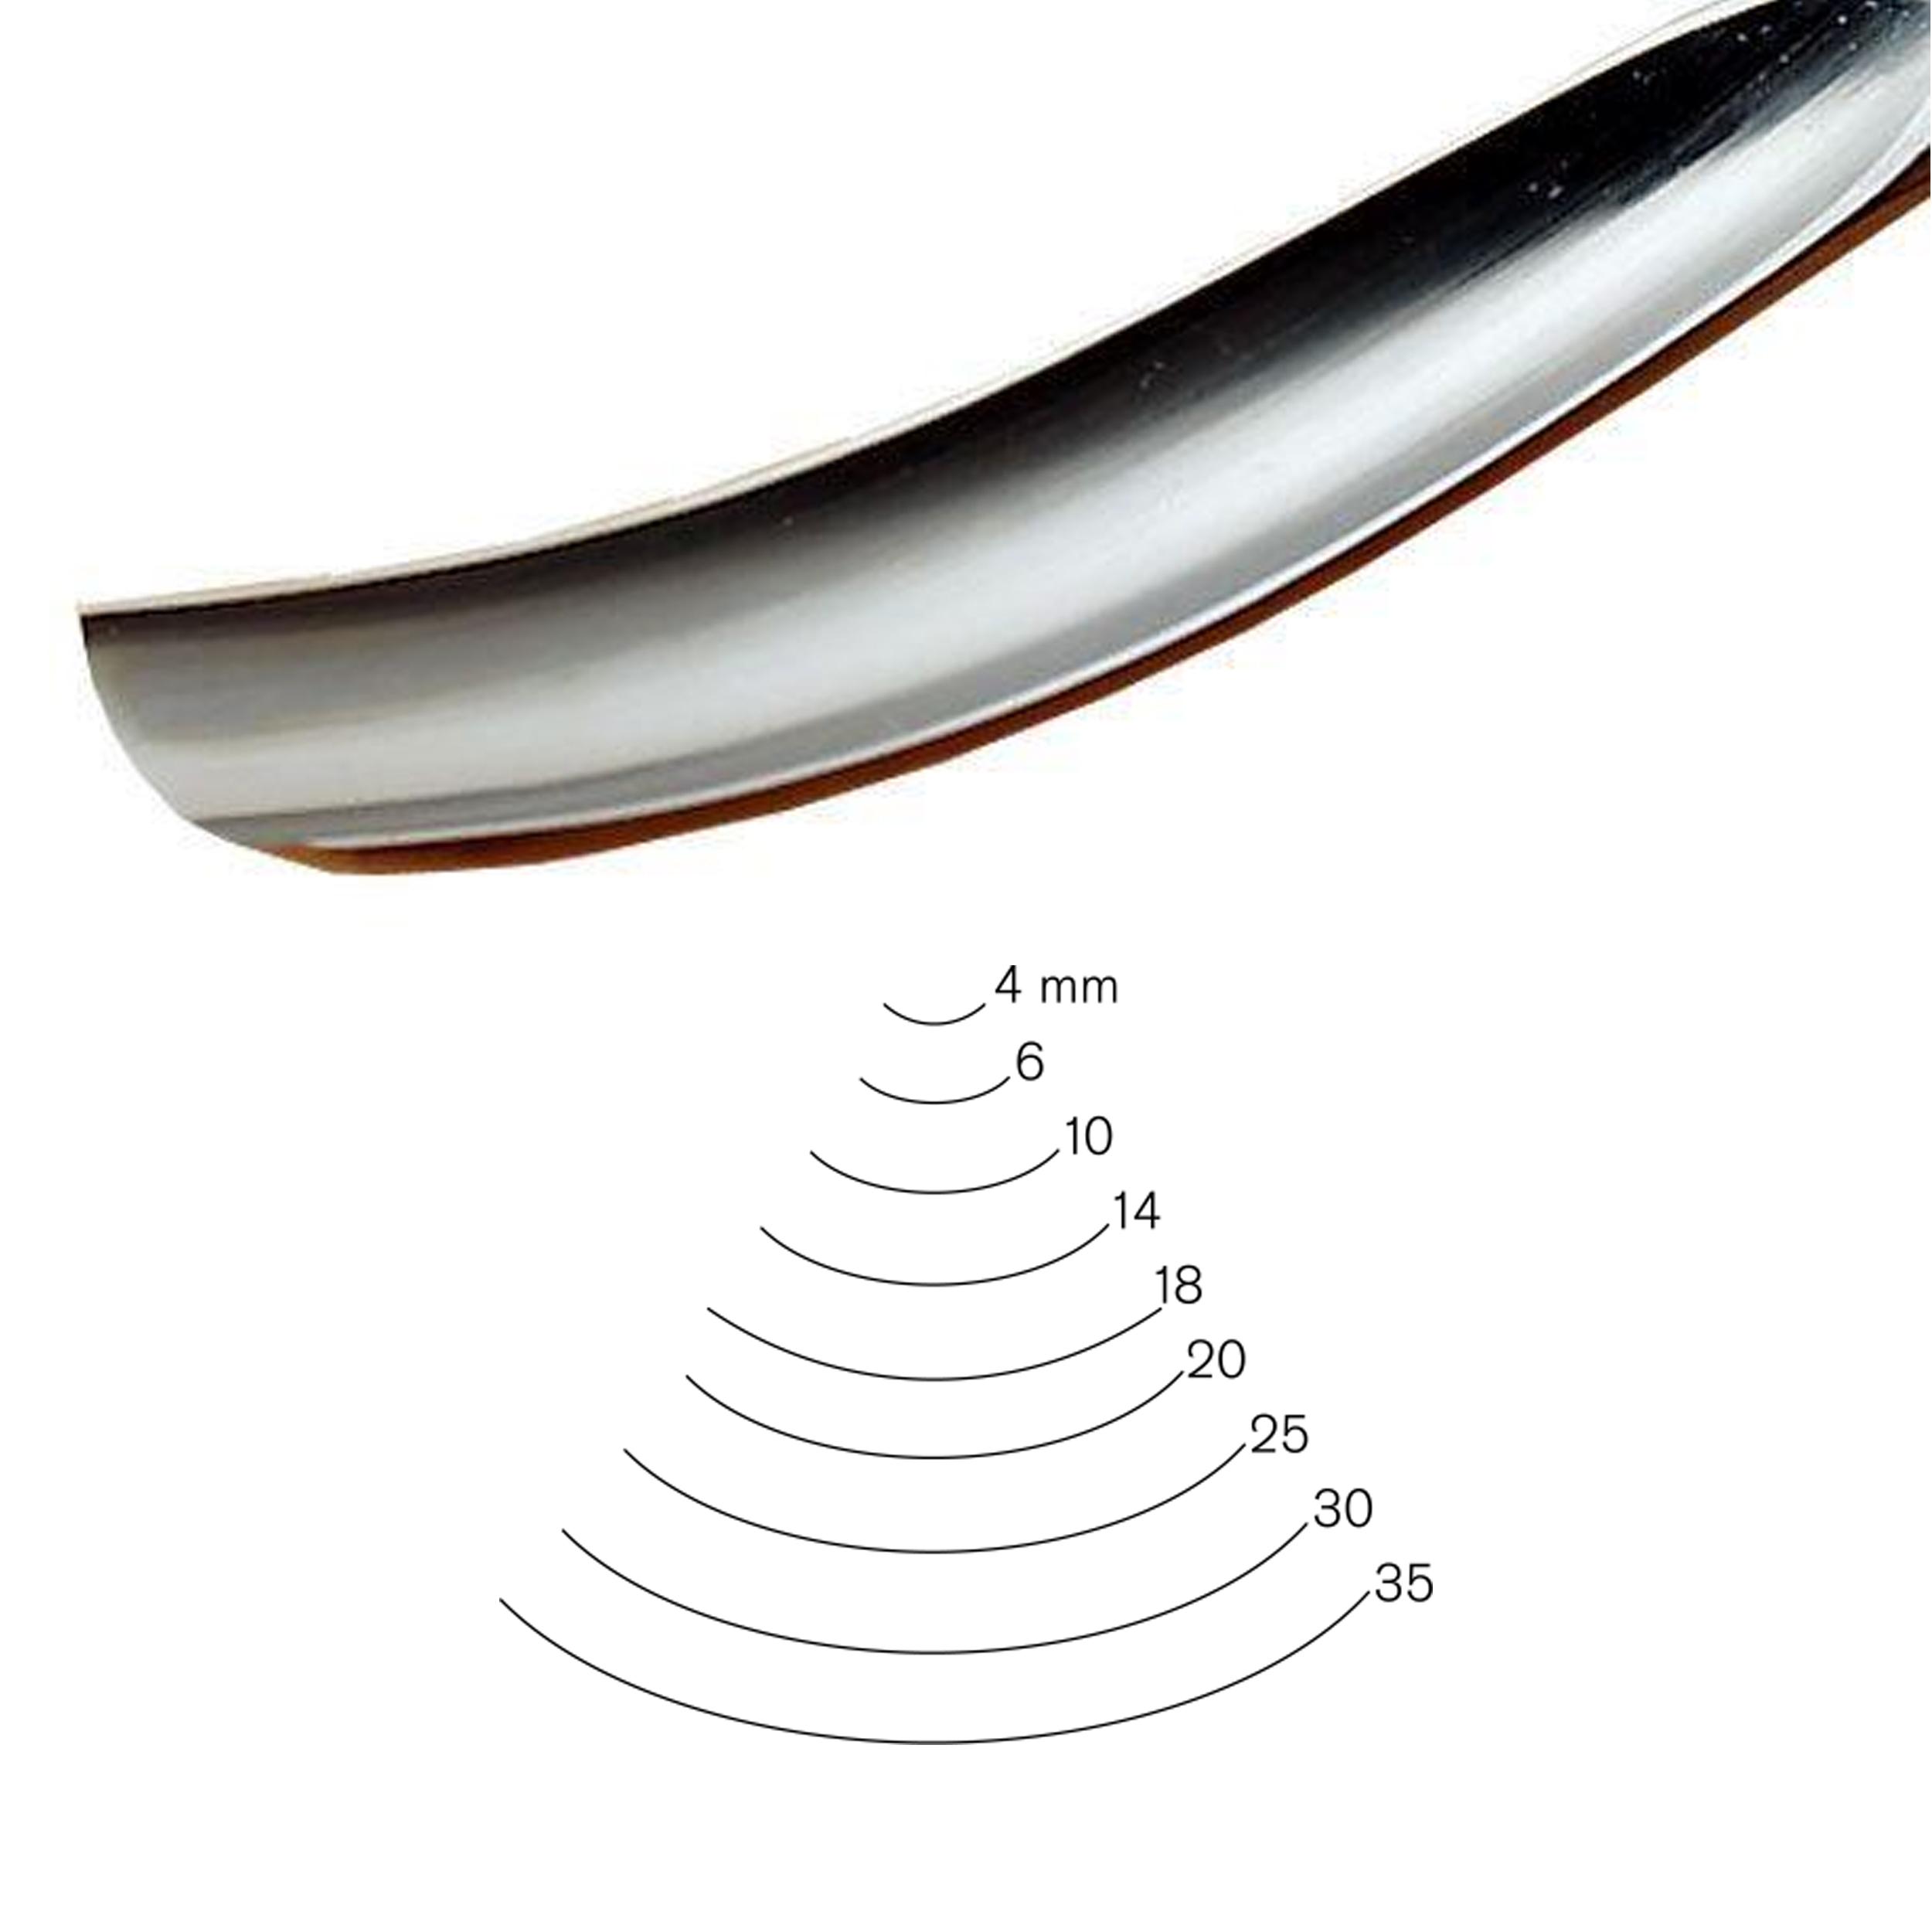 #7 Sweep Bent Gouge 30 mm, Full Size